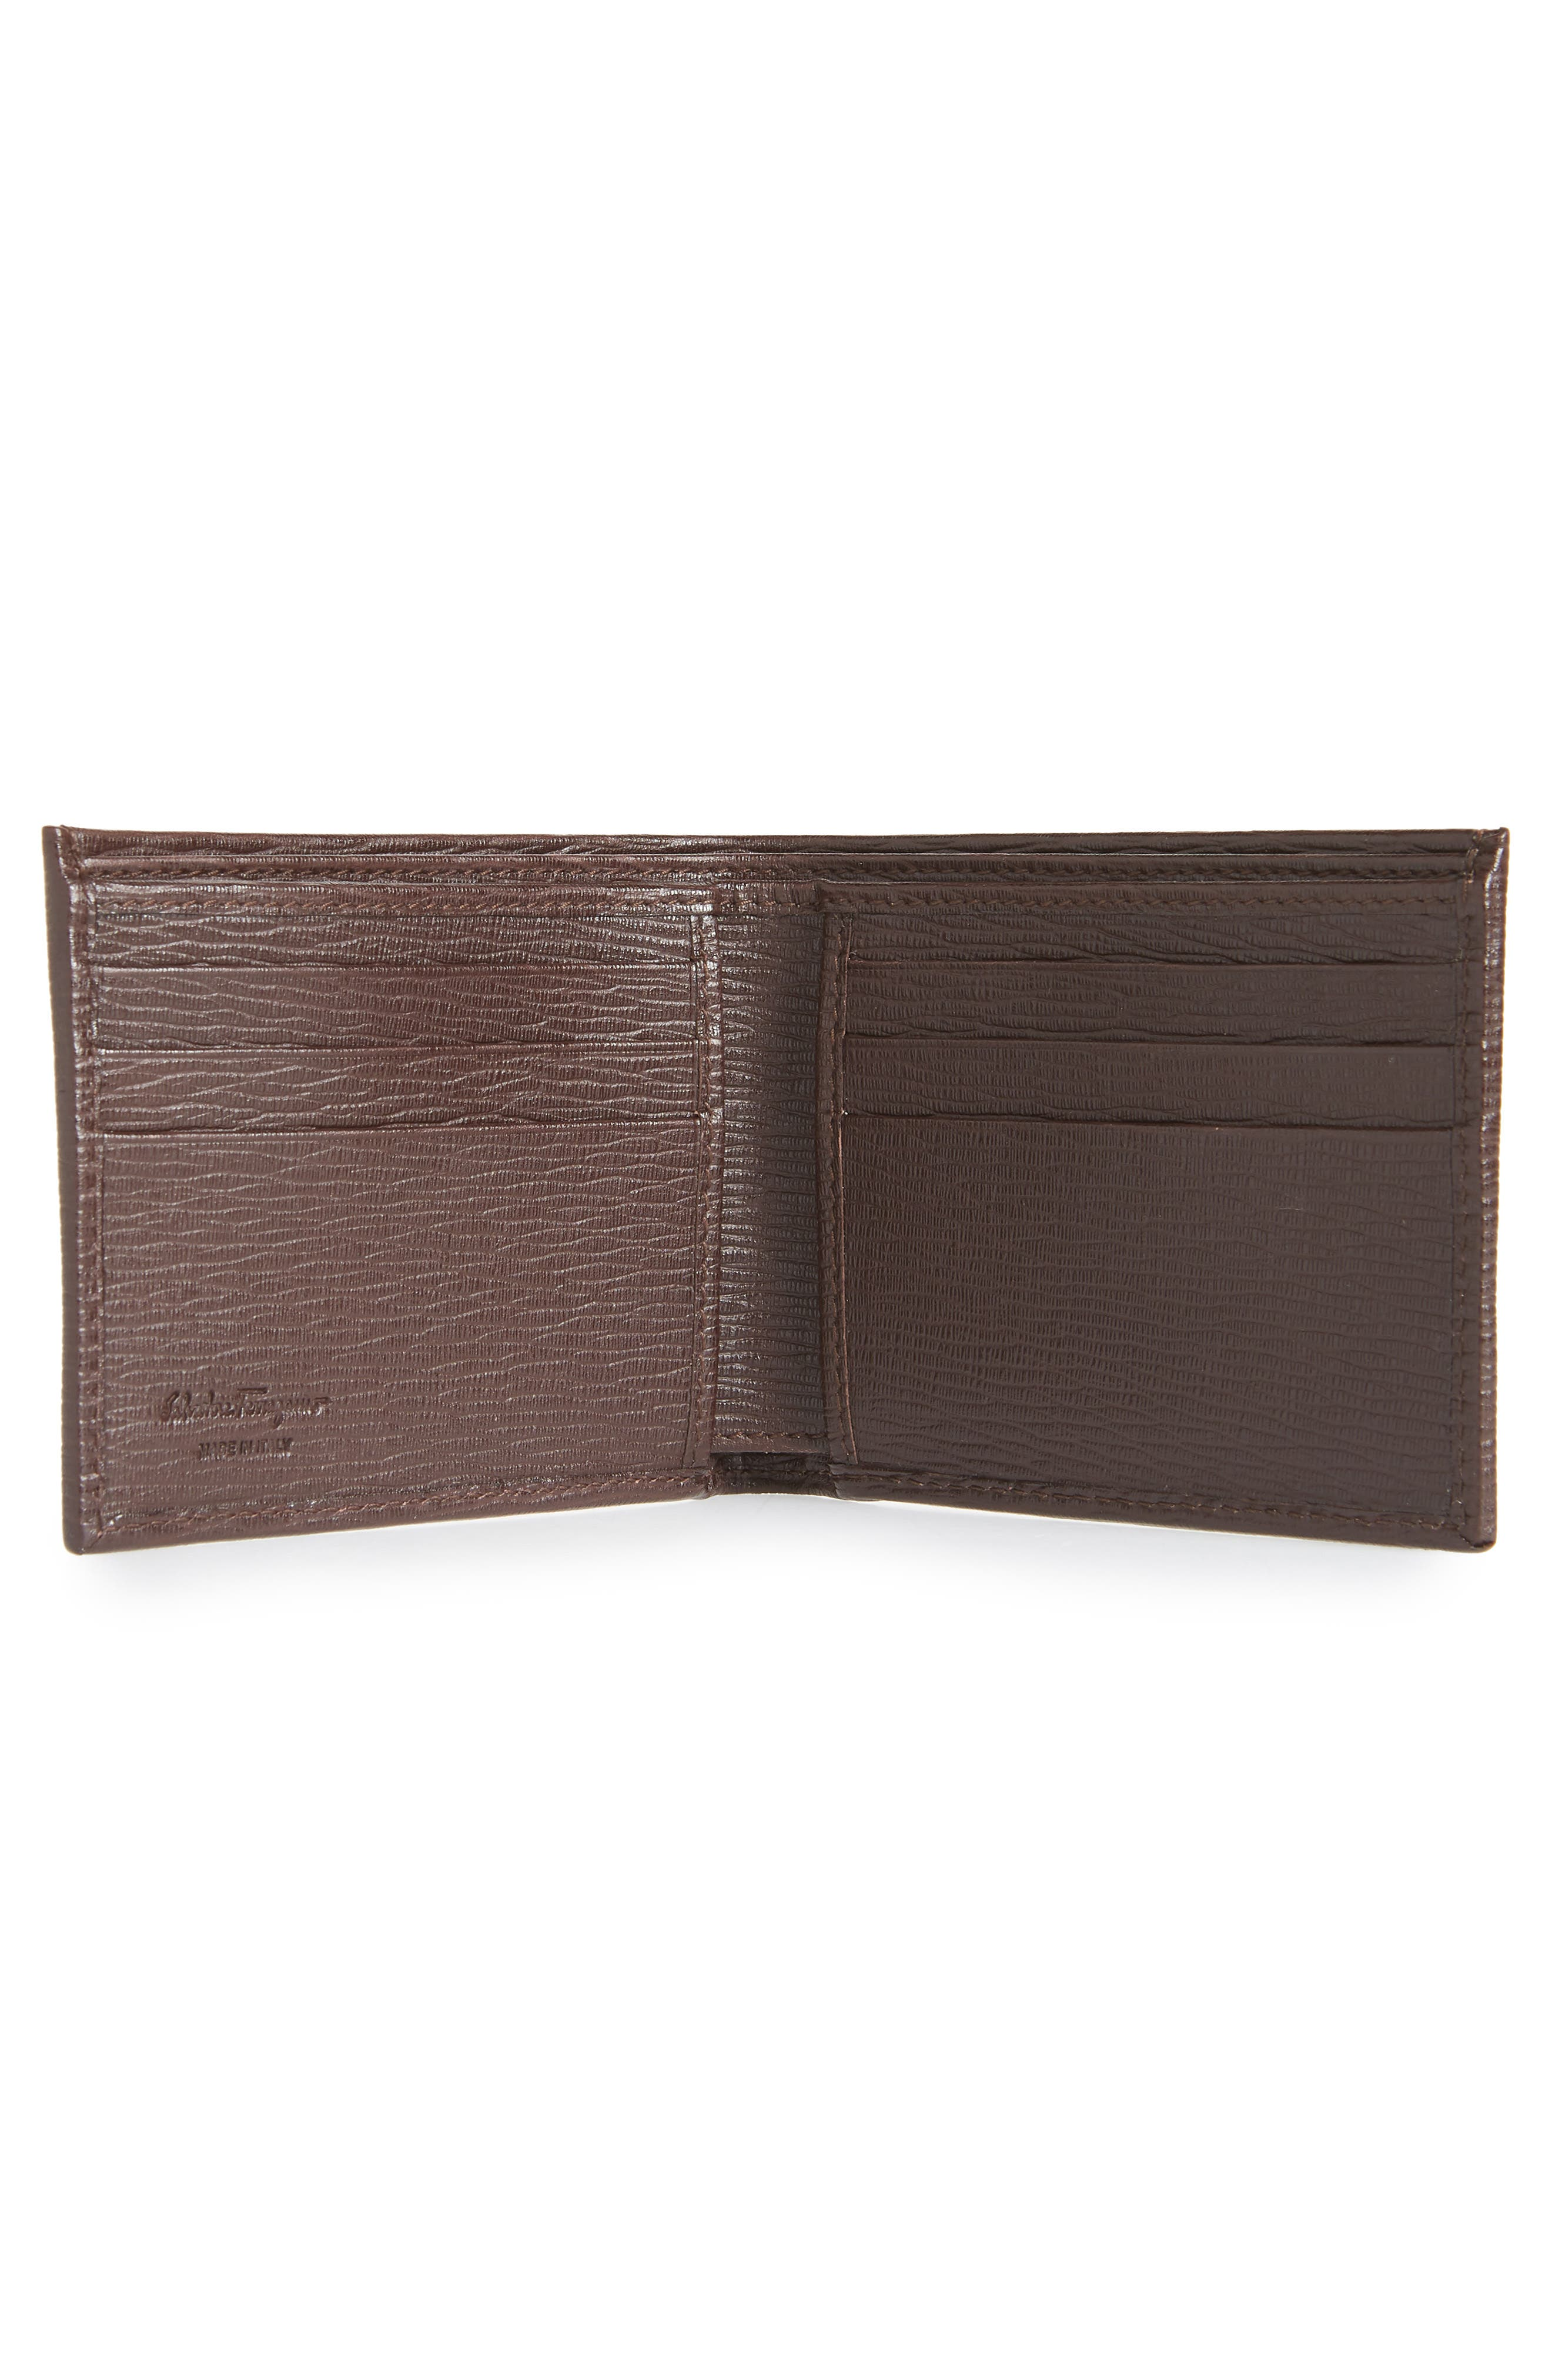 Revival Gancio Bifold Leather Wallet,                             Alternate thumbnail 2, color,                             TOBACCO